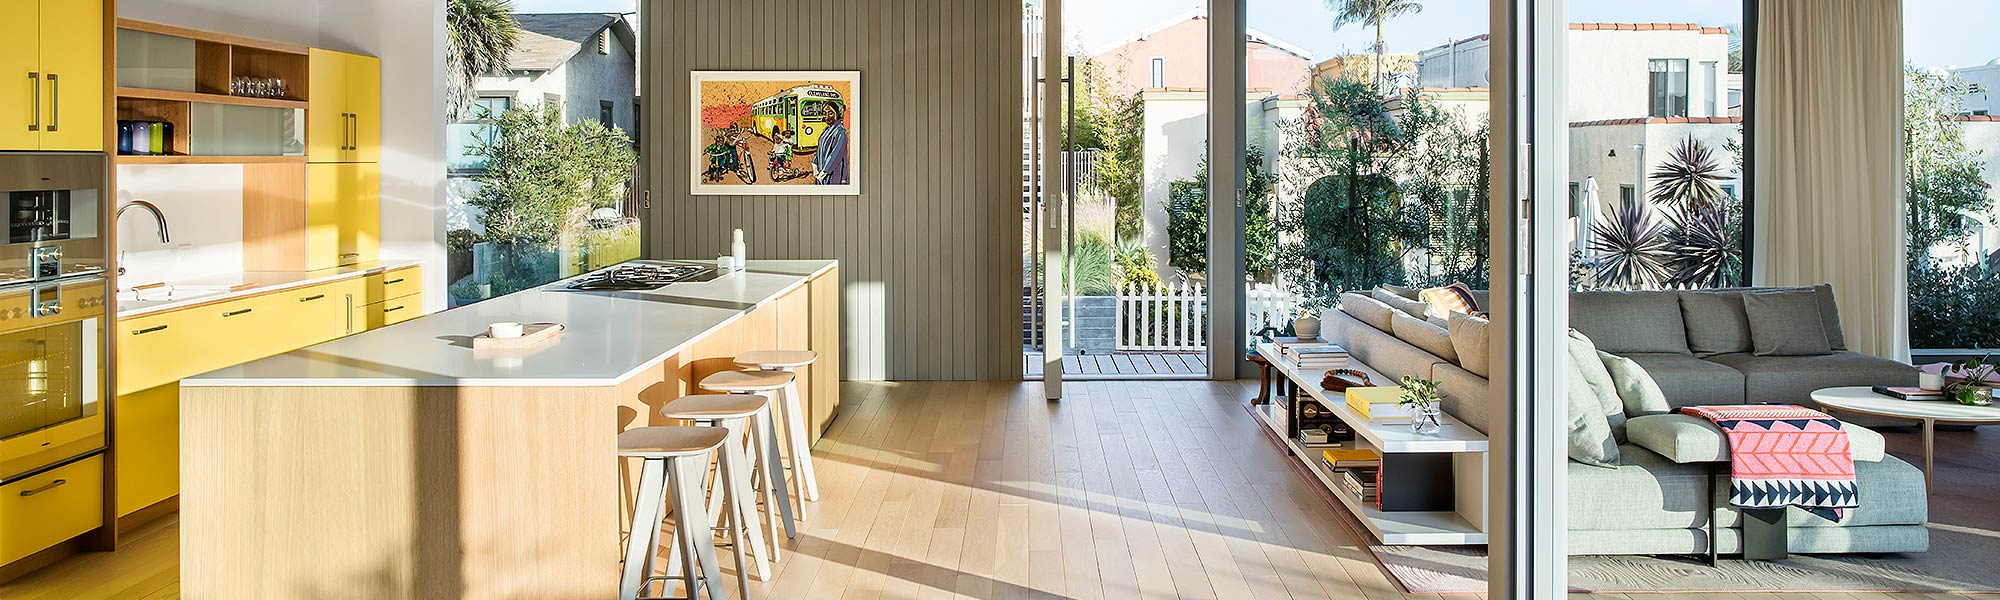 Our Process - 31st Street kitchen - LMD Architecture Studio